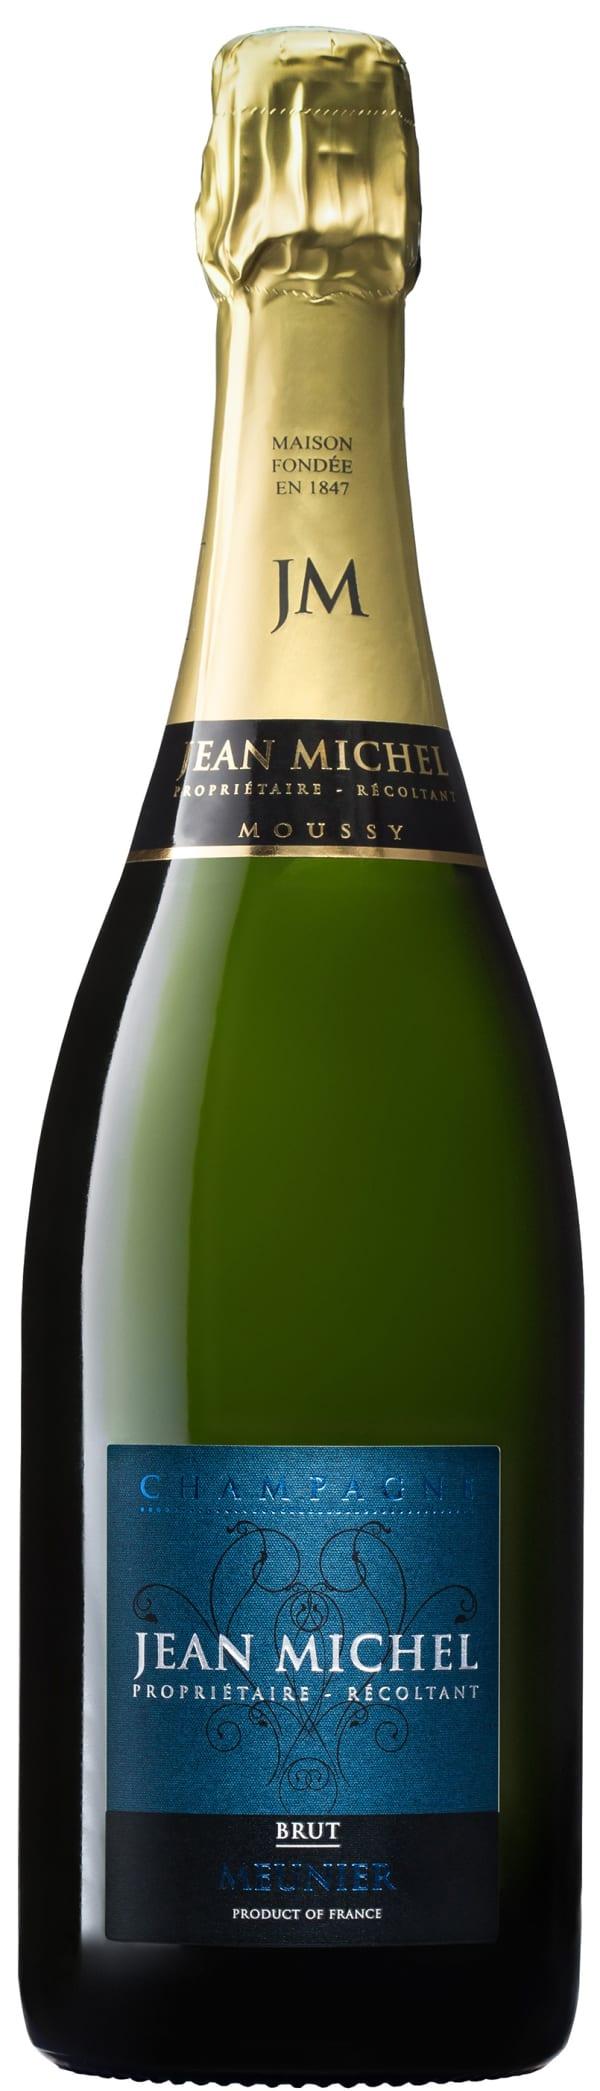 Jean Michel Meunier Champagne Brut 2012